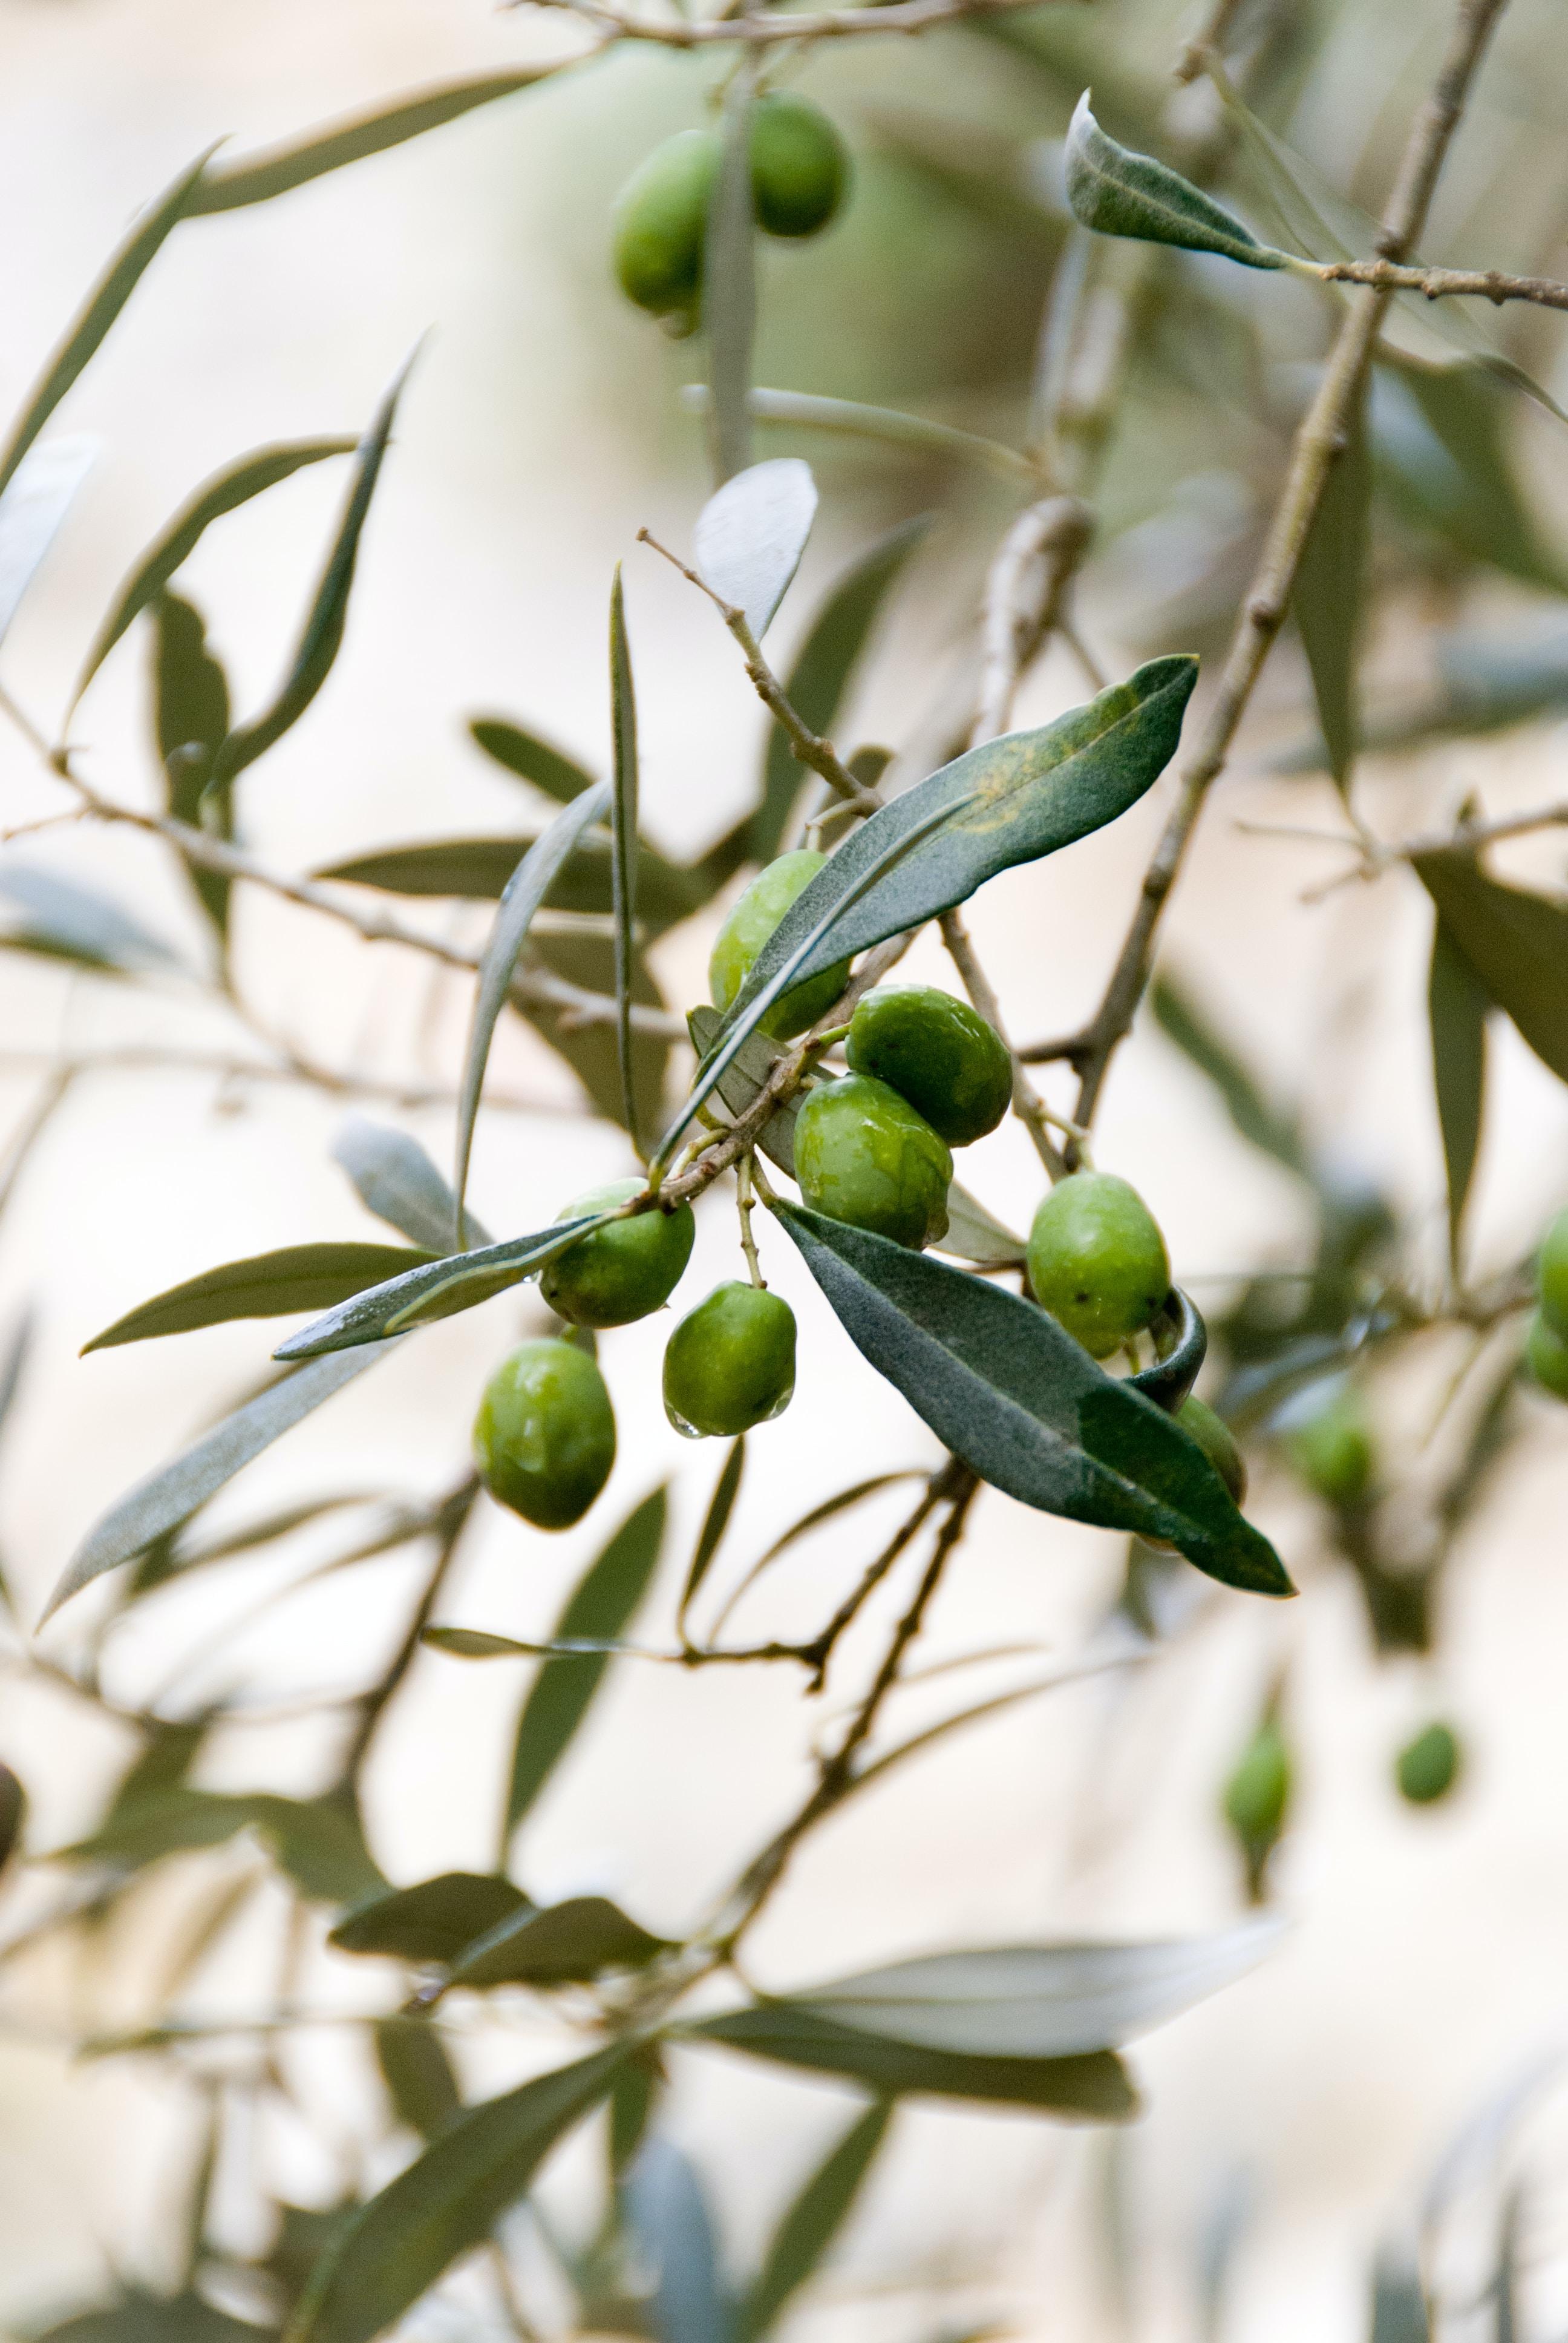 macro photography of olive fruits